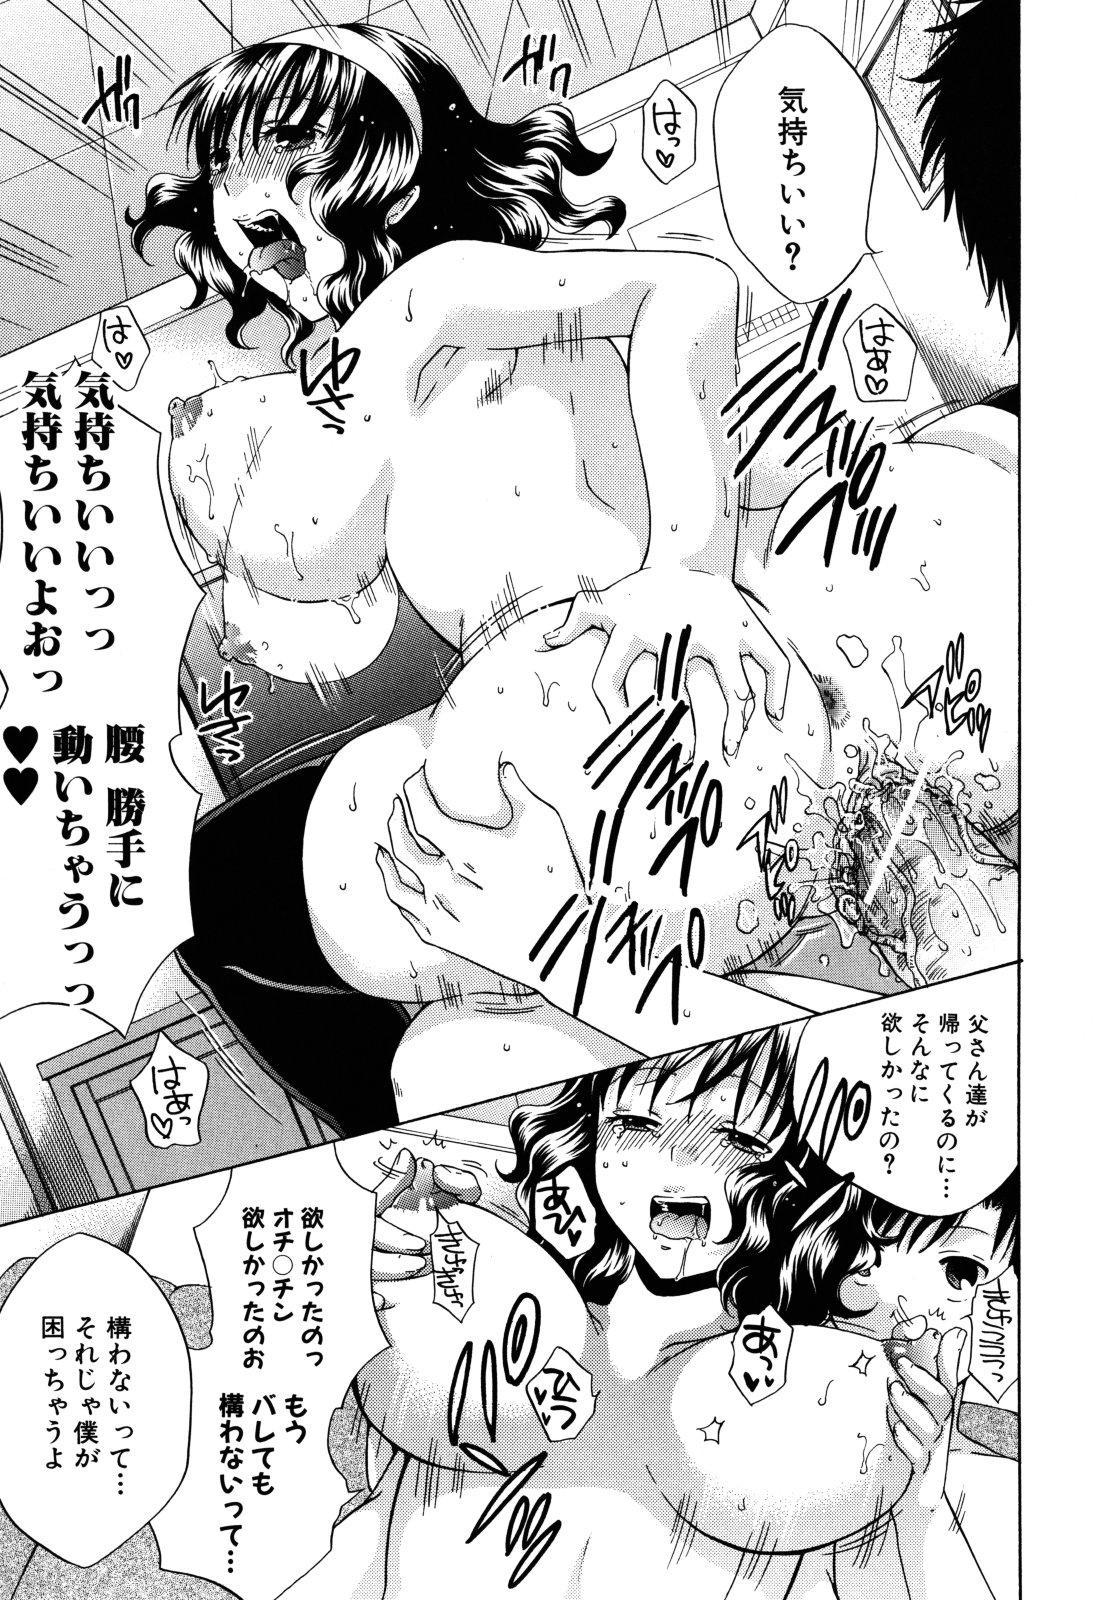 Kanojo ga Ochiru made - She in the depth 22